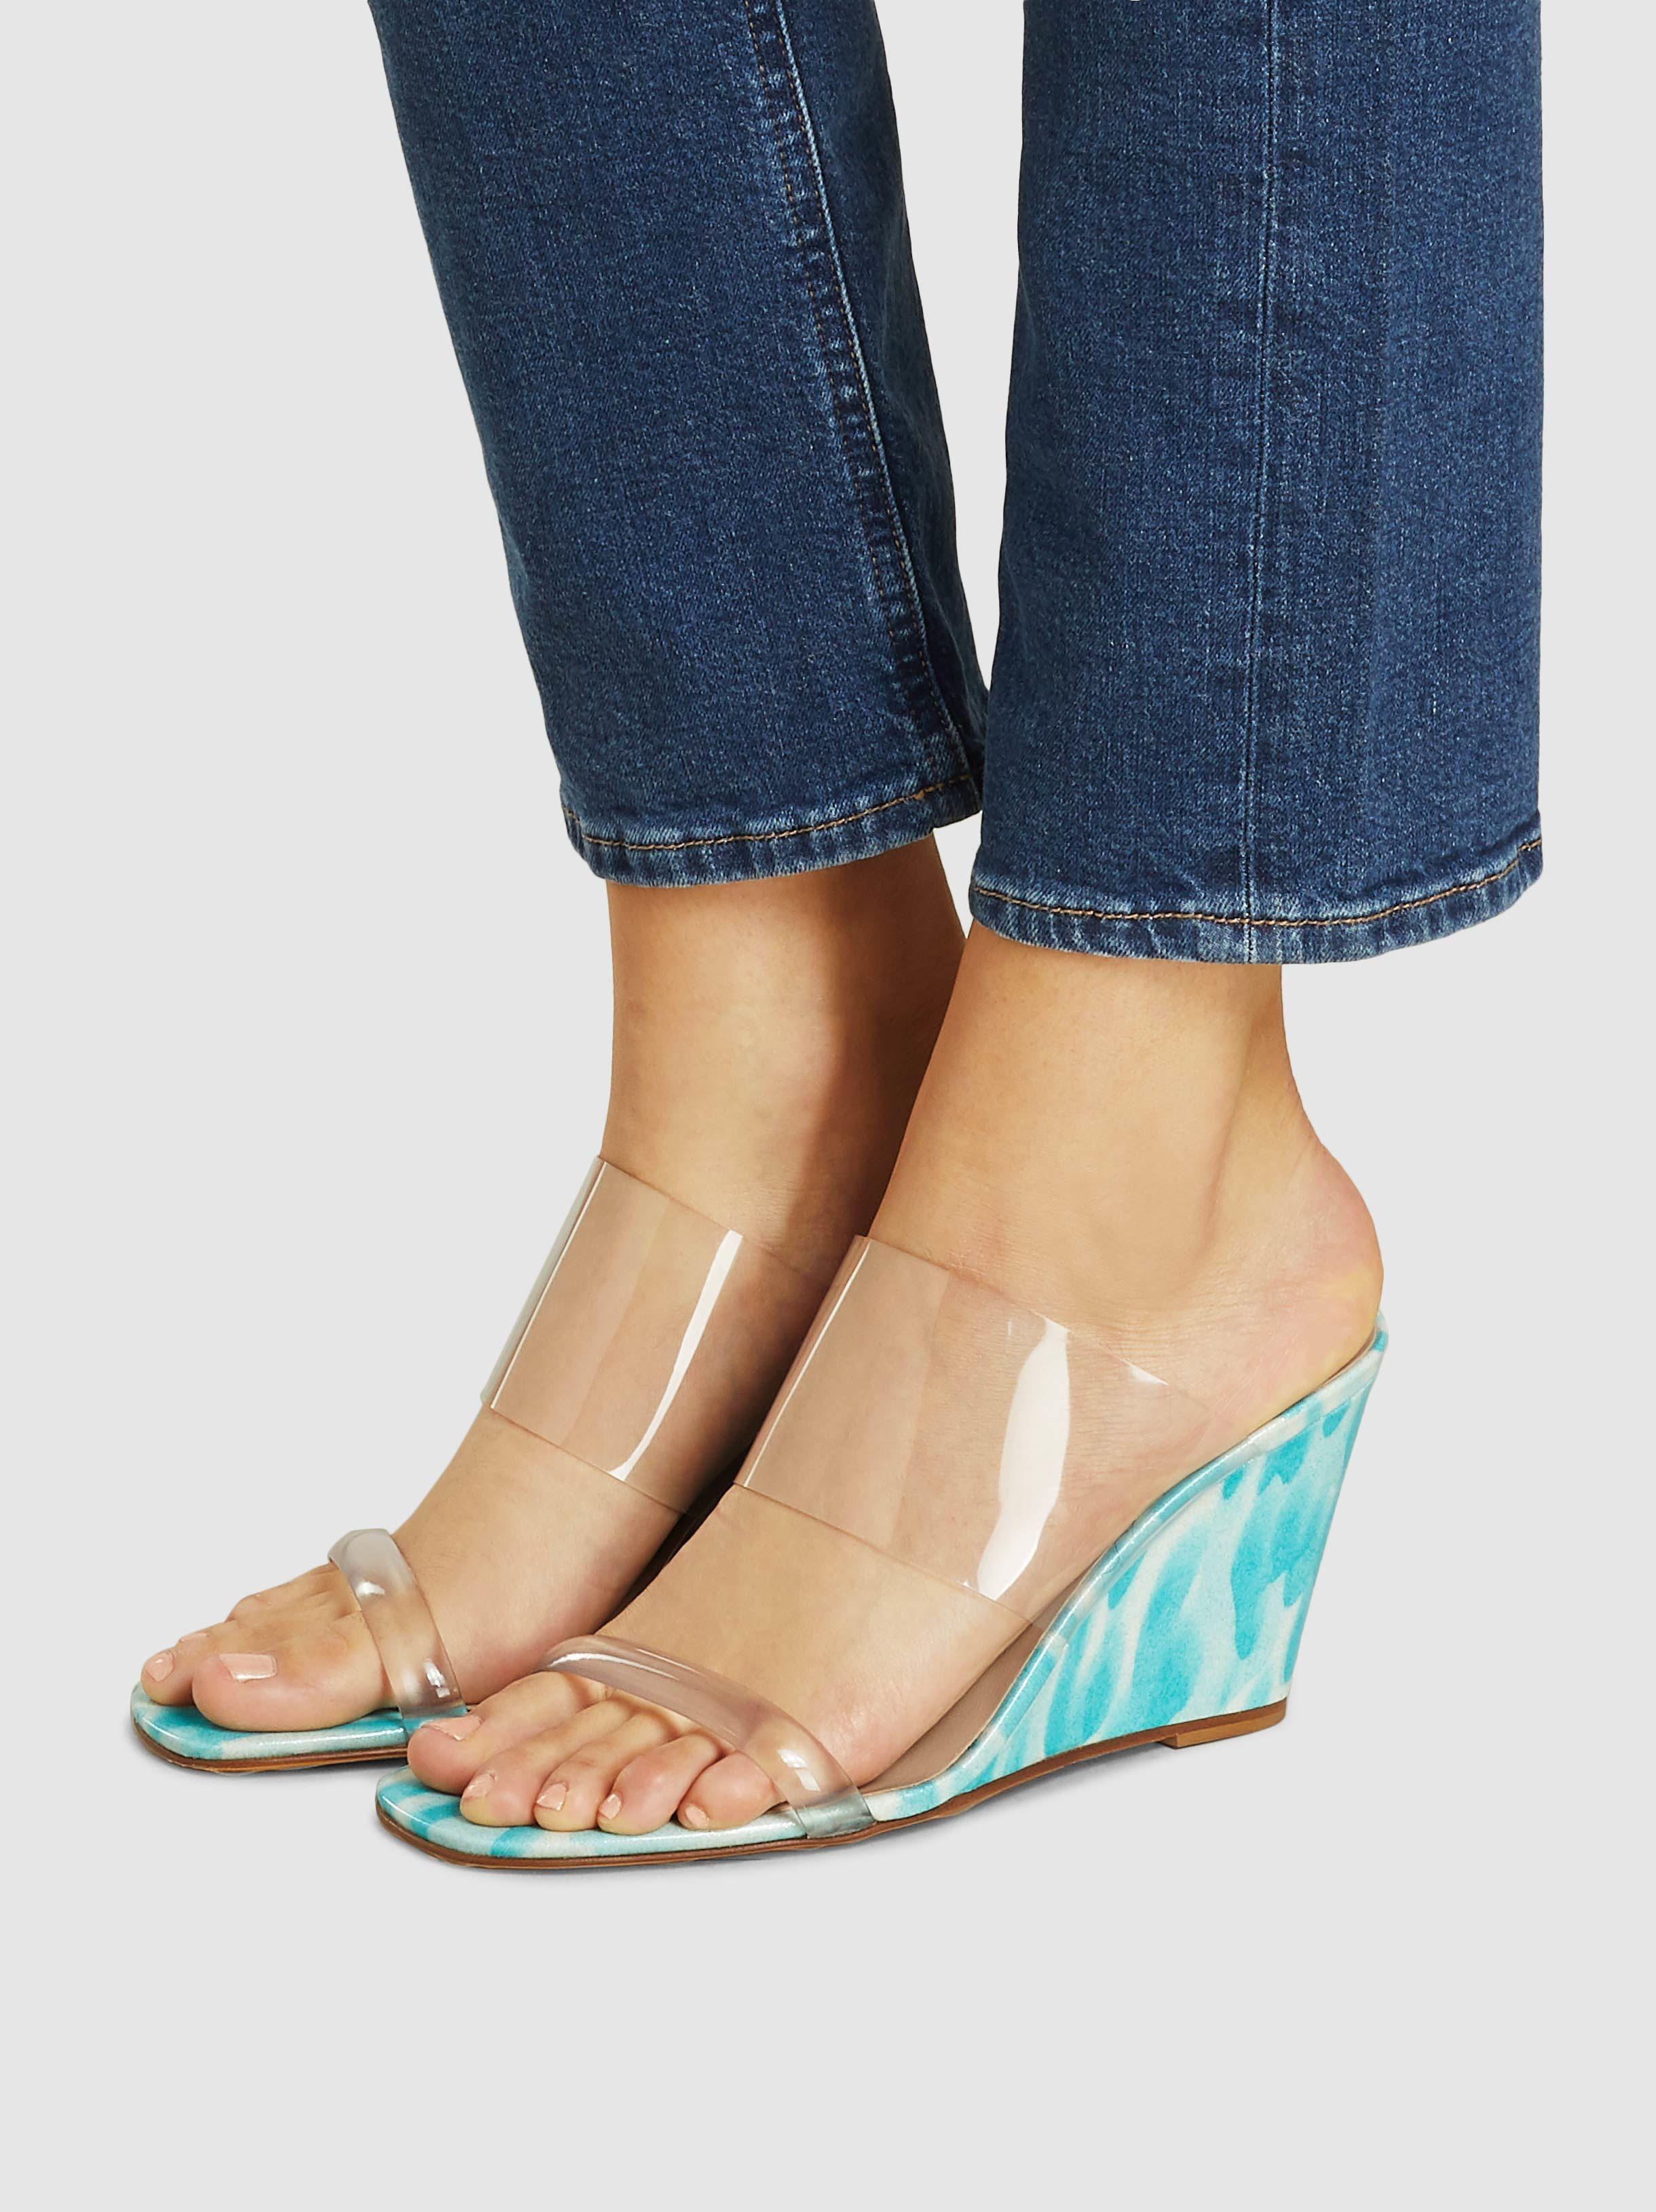 5e7982d3ecc Maryam Nassir Zadeh - Blue Olympia Wedge Sandals - Lyst. View fullscreen